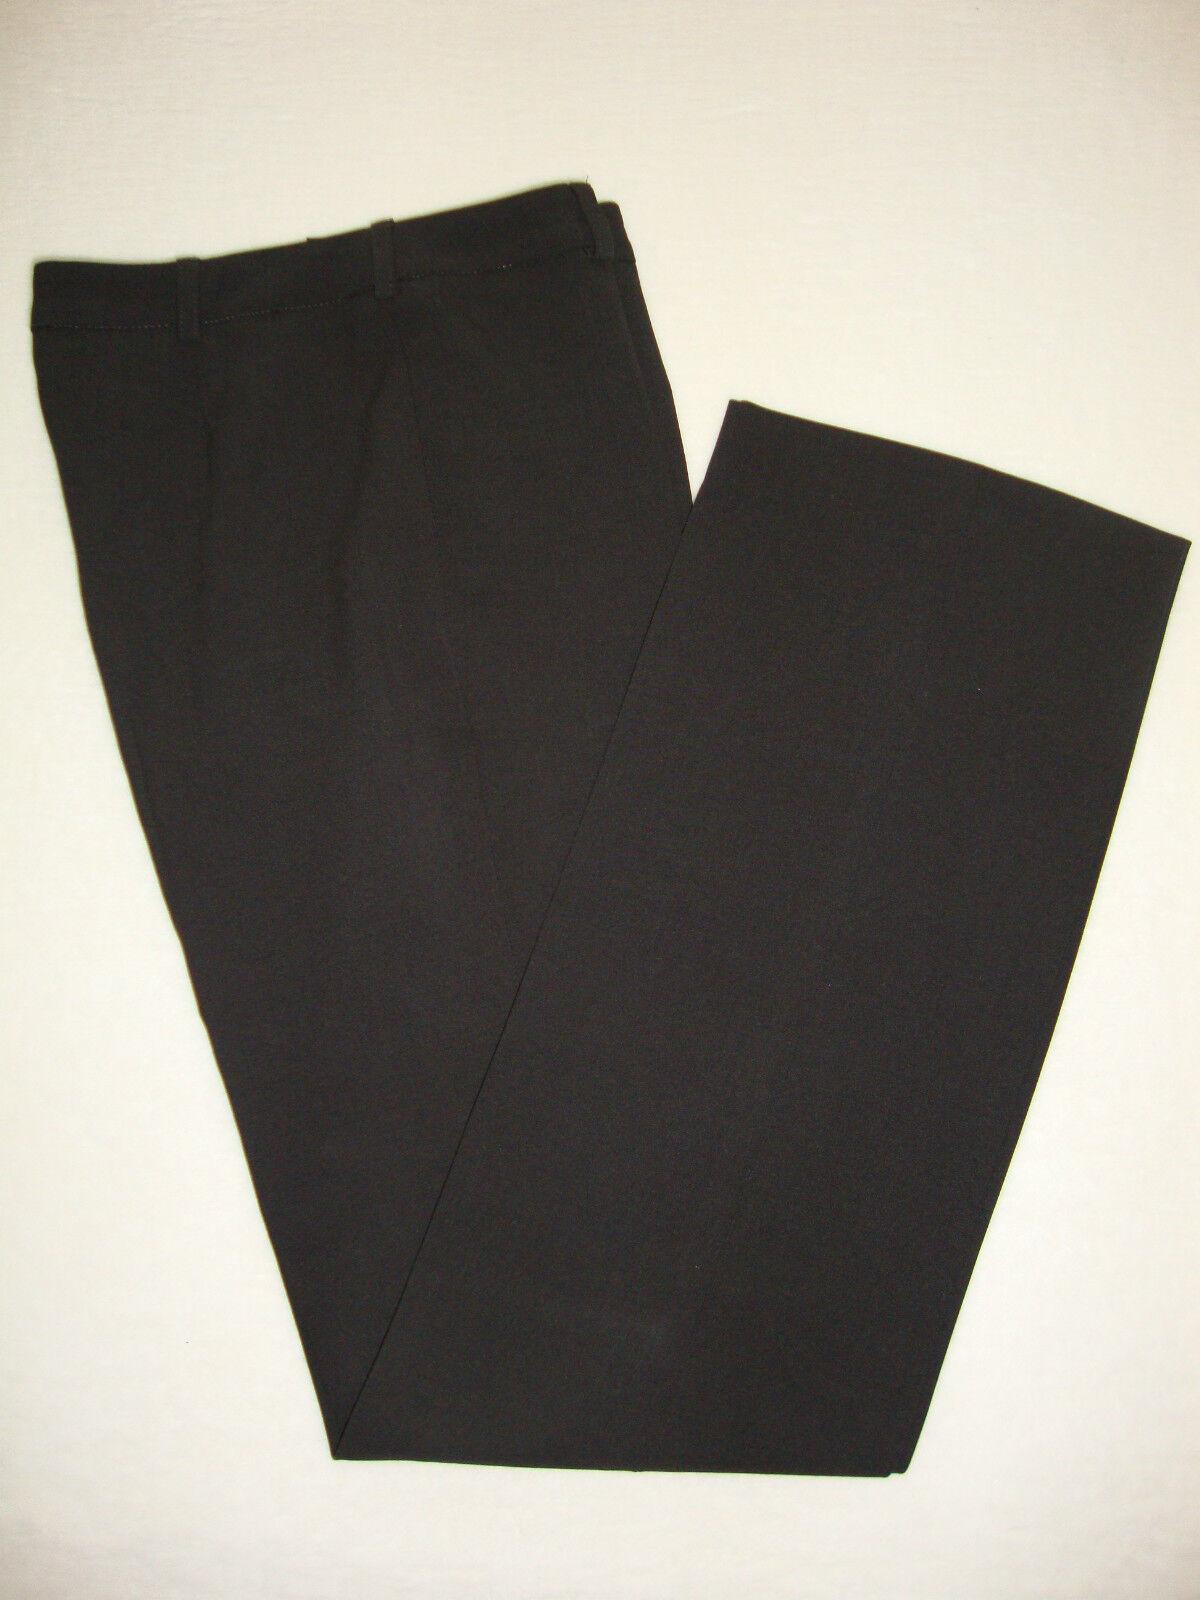 Armani Collezioni Damenhose Hose mit Bügelfalte dunkel braun Gr.34 NEU NP